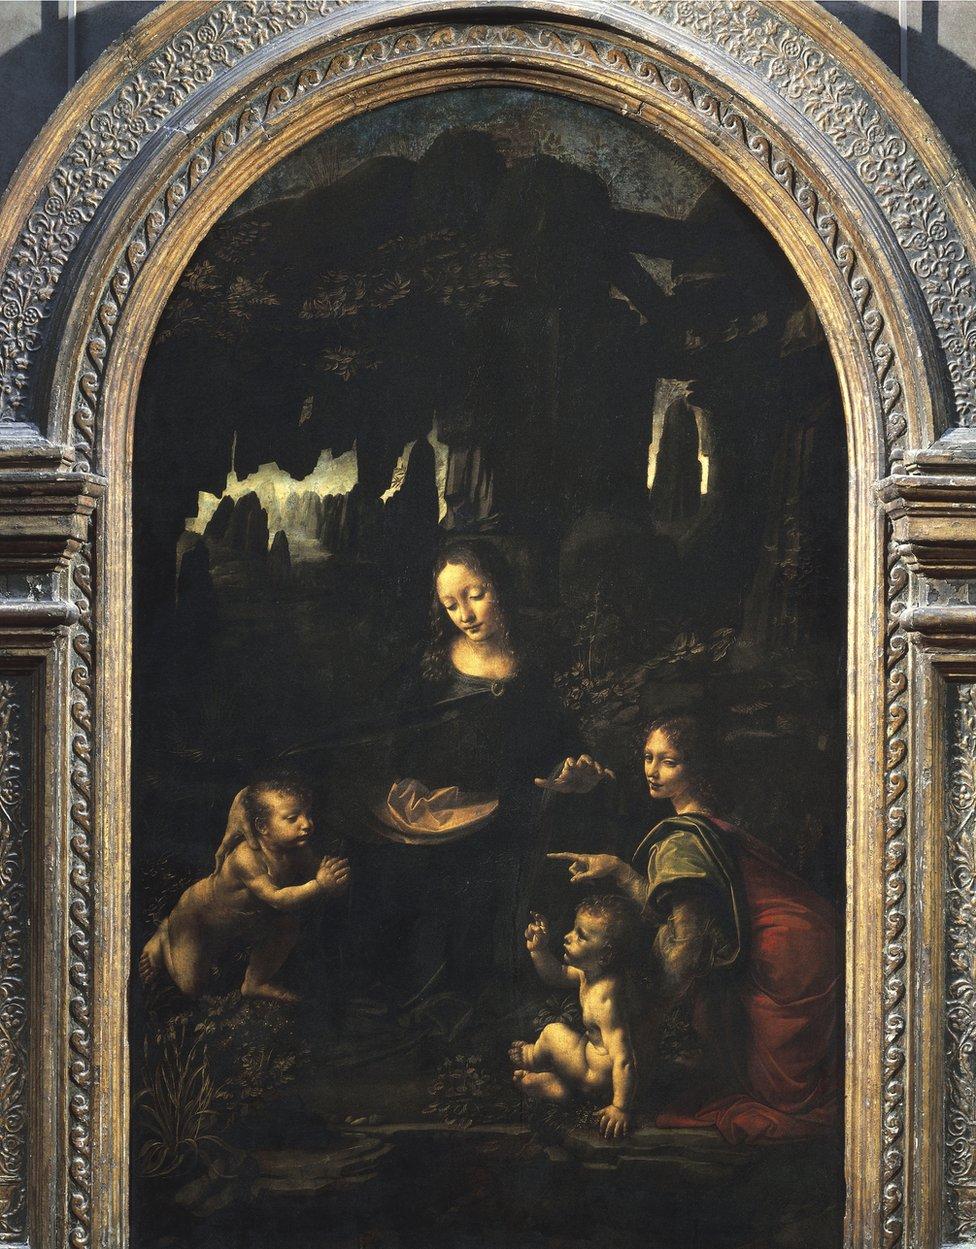 Leonardo da Vinci's first version of the Virgin of the Rocks (1483-1486) is in the Louvre